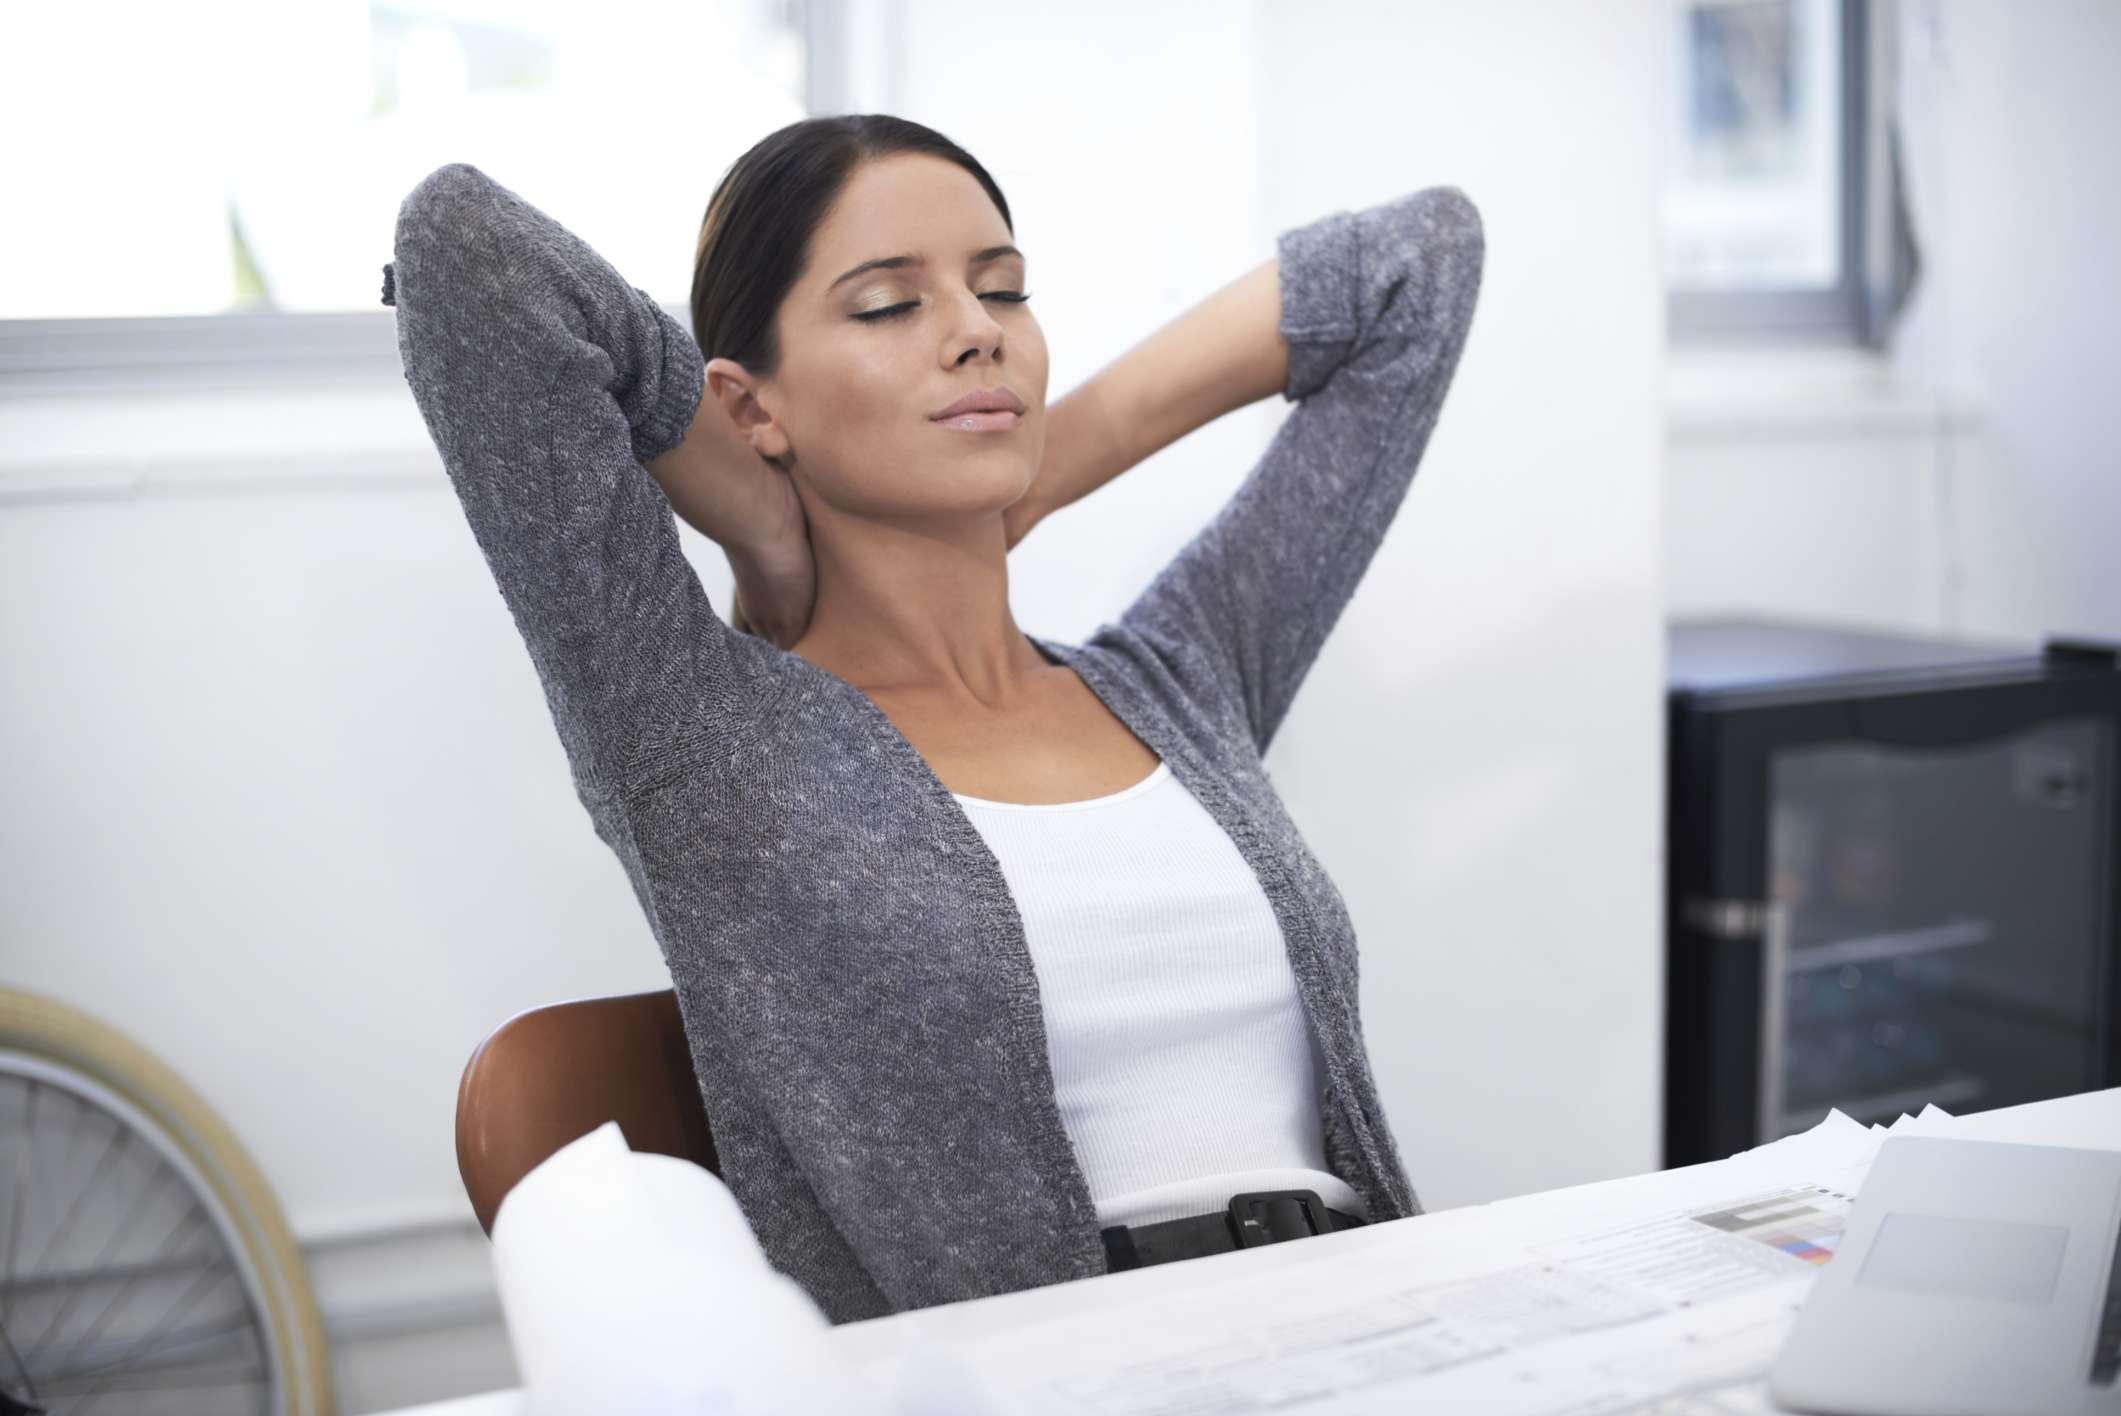 meditation-mini-break-relax-office-Yuri_Arcurs.jpg